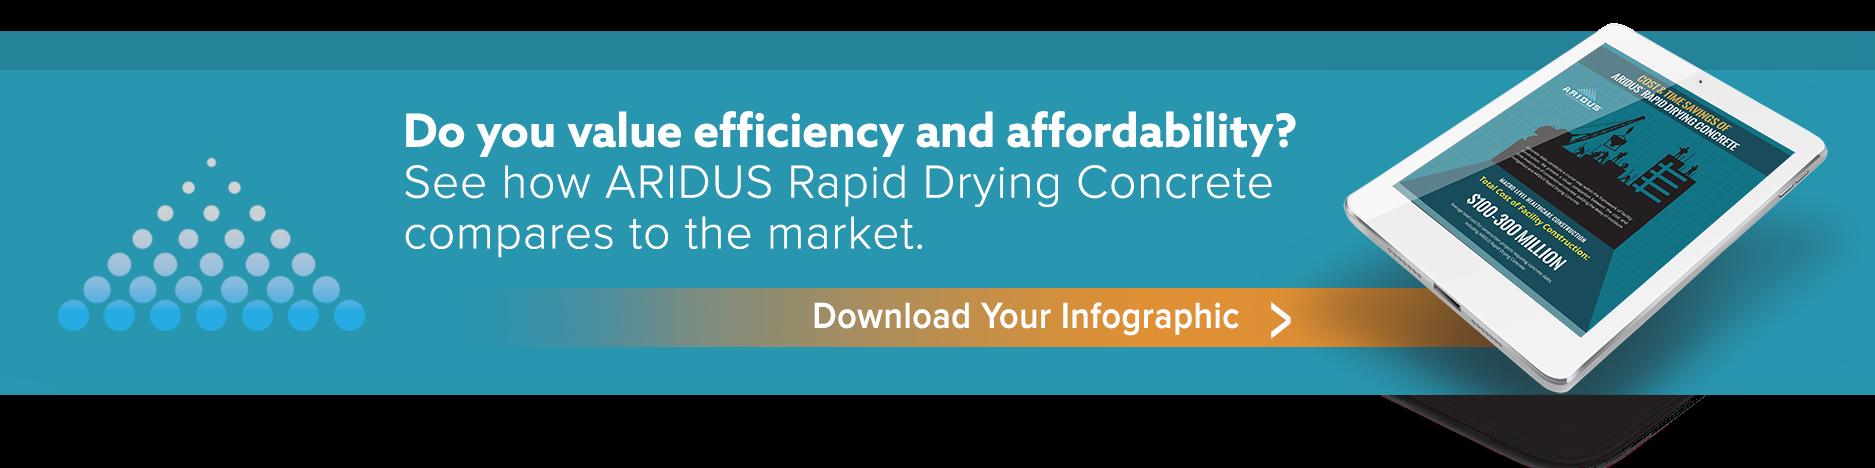 ARIDUS Rapid-Drying Concrete | Speed To Revenue